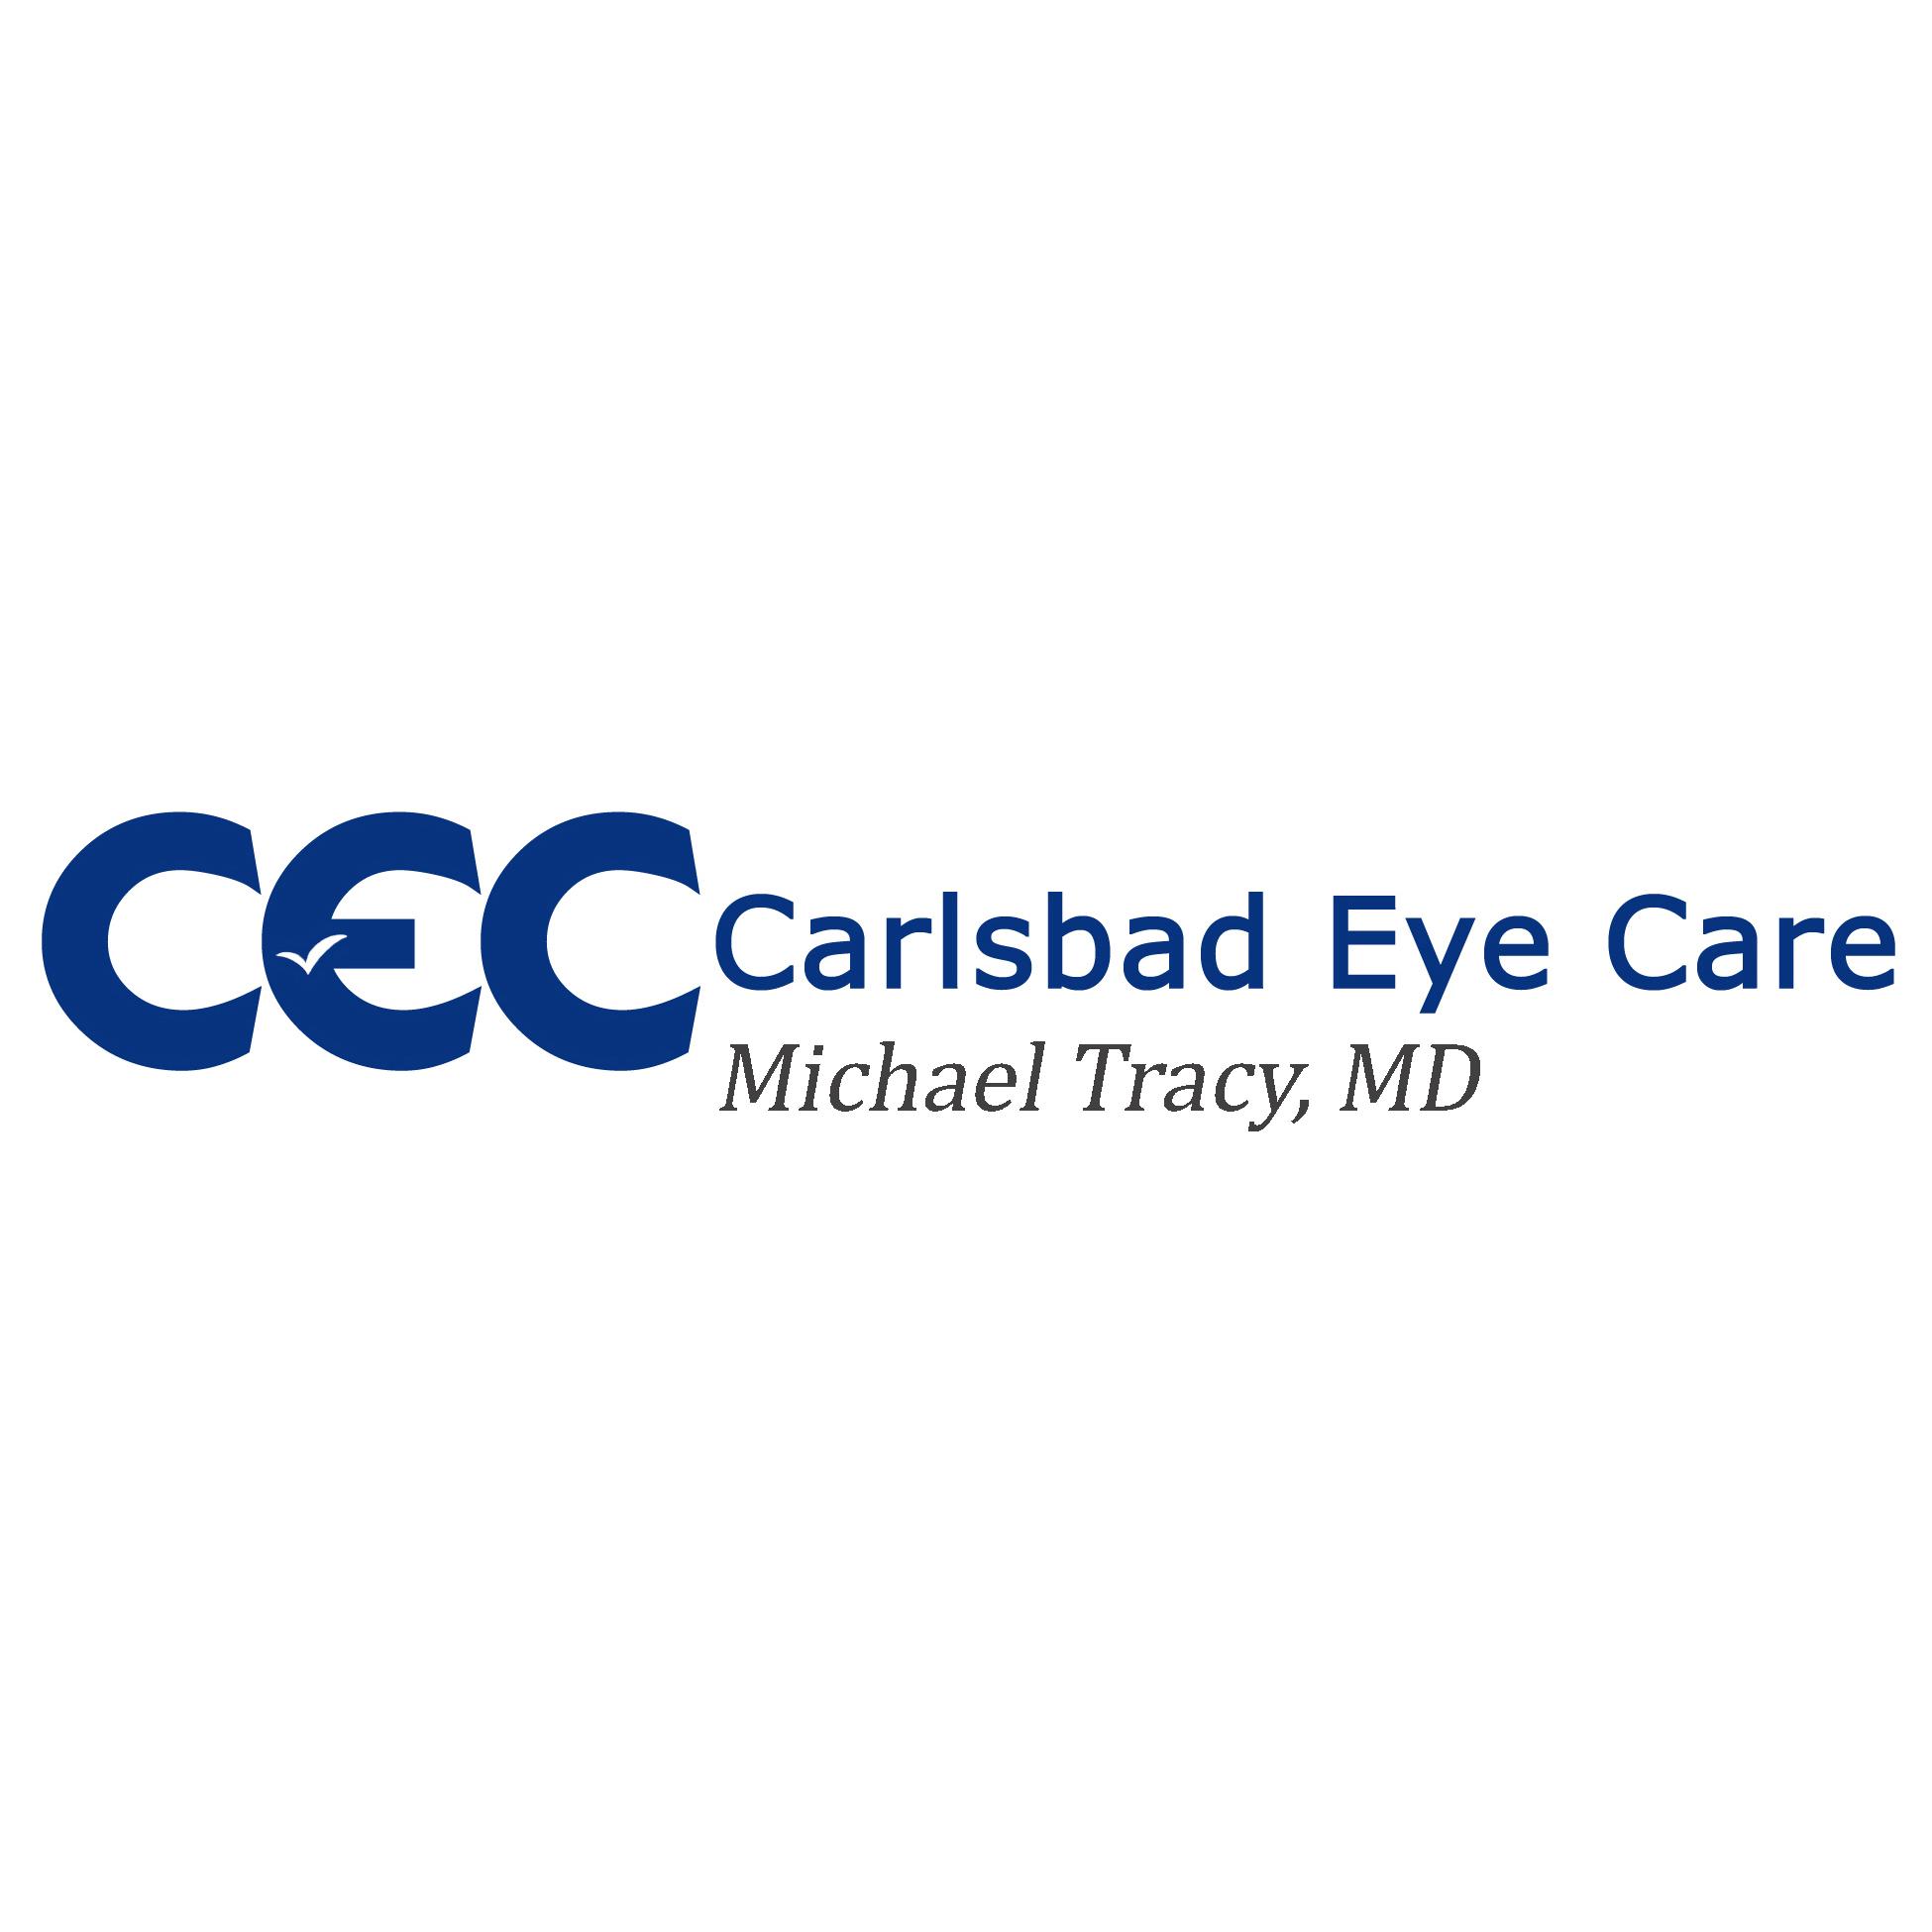 Carlsbad Eye Care image 5